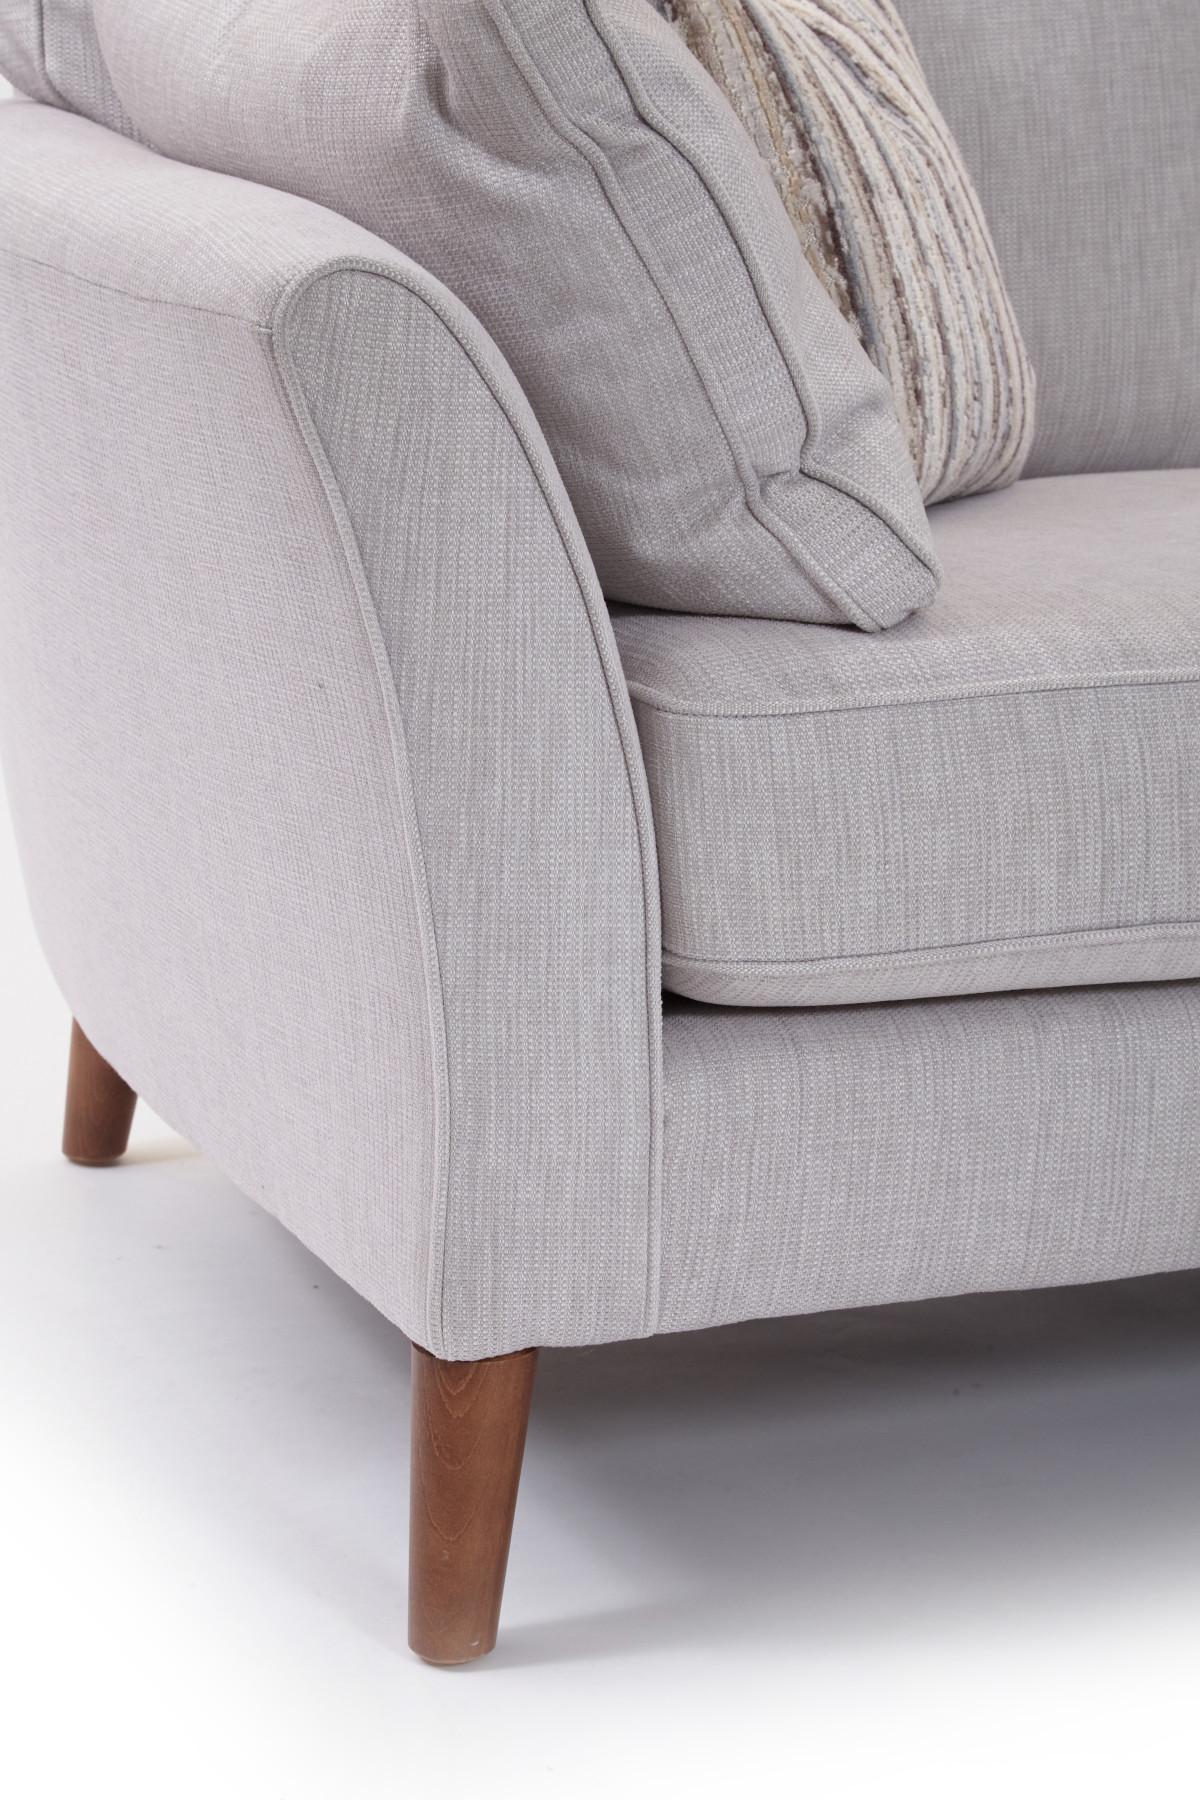 Hindley 3 Seater Sofa